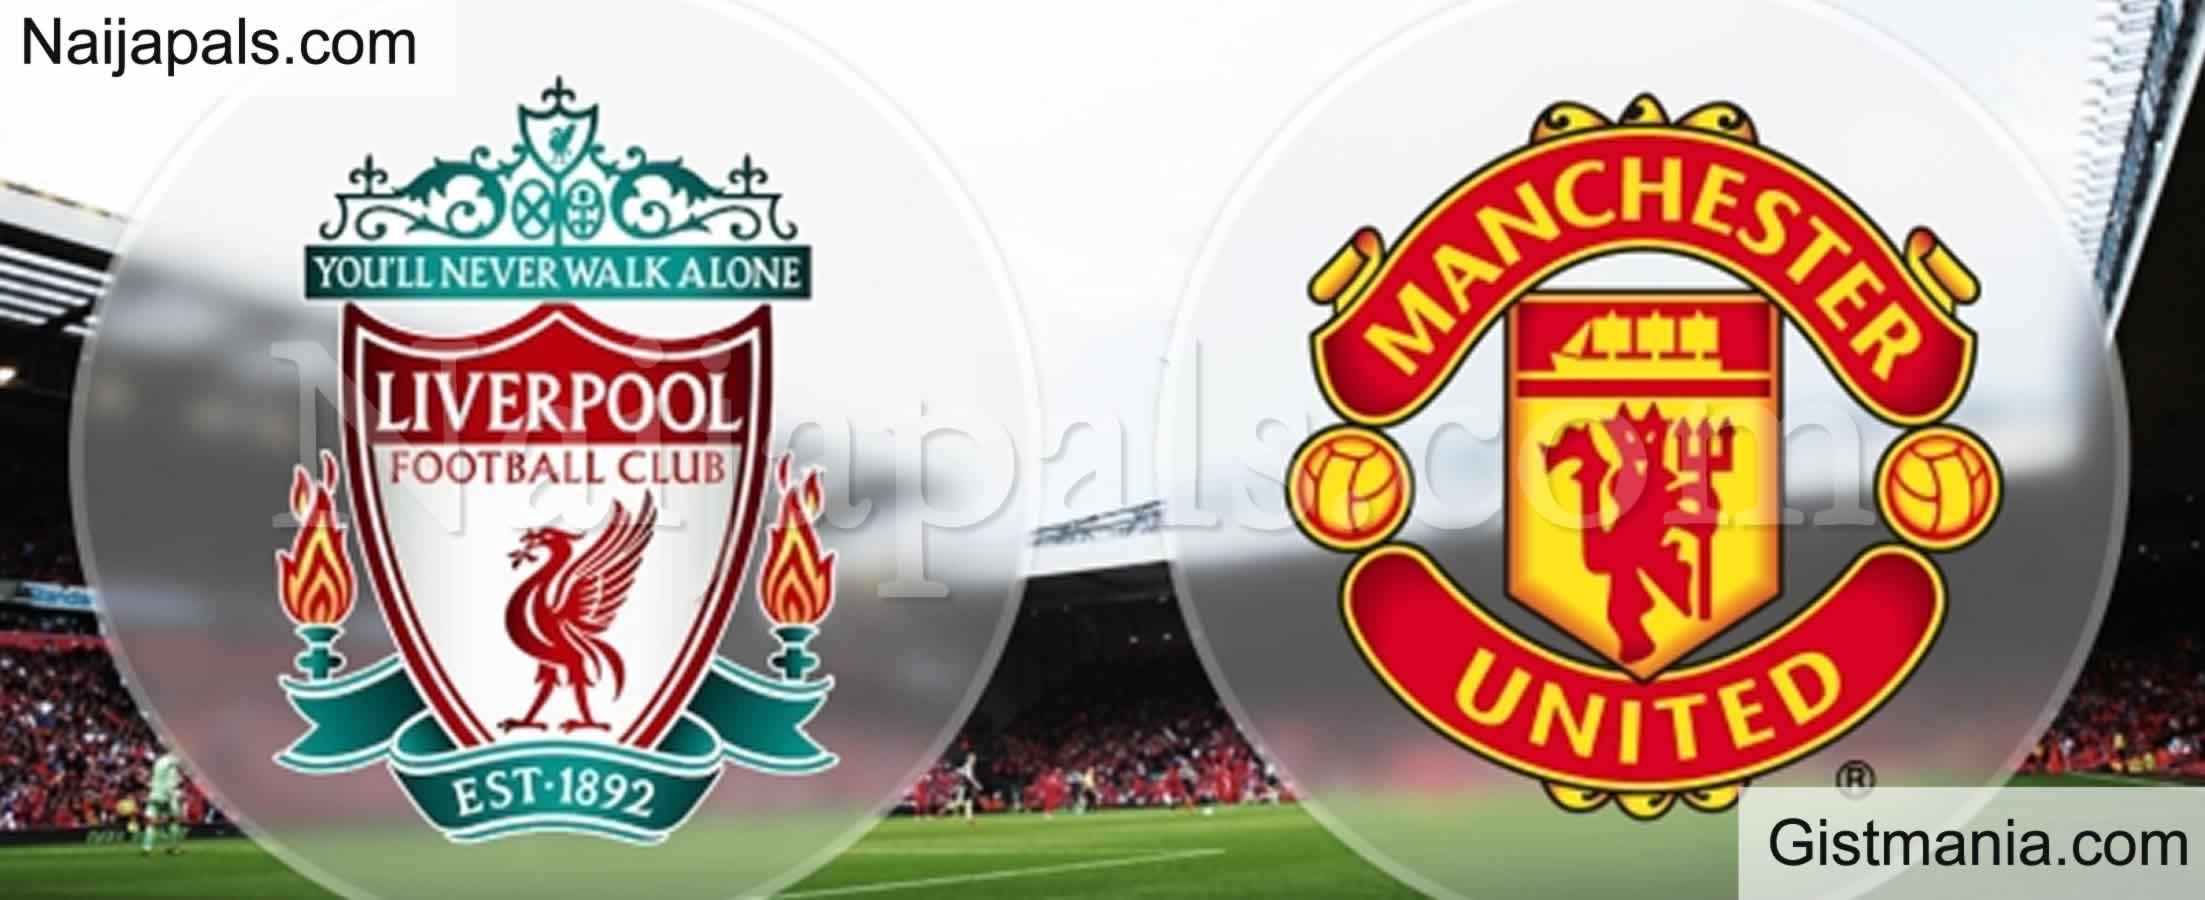 <img alt='.' class='lazyload' data-src='https://img.gistmania.com/emot/soccer.gif' /> <b>Liverpool v Manchester United : English Premier League Match, Team News, Goal Scorers and Stats</b>